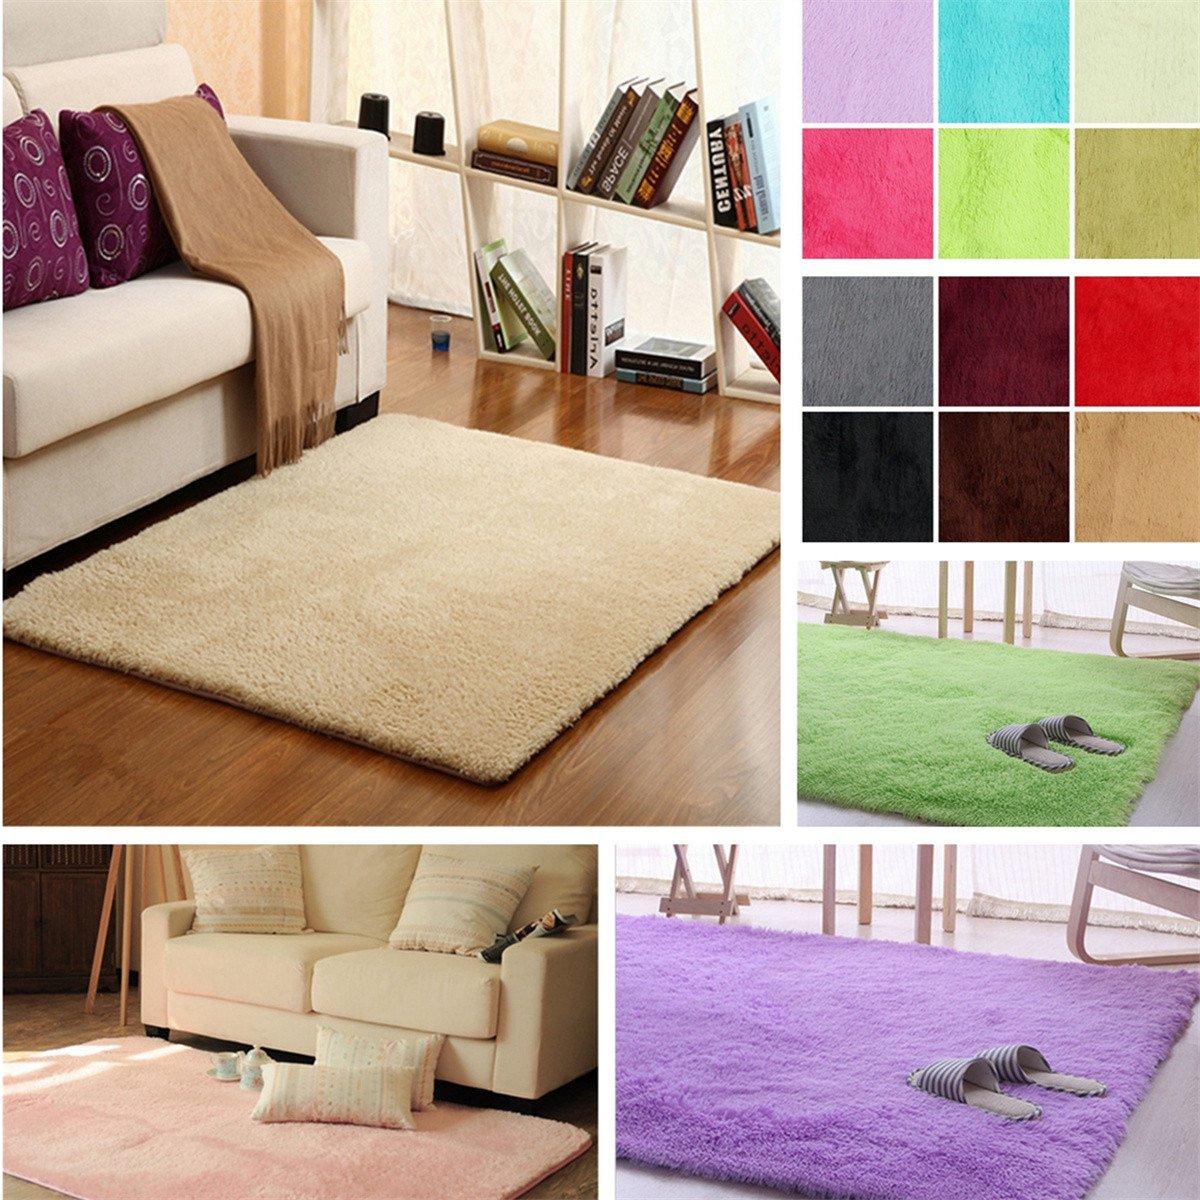 2 Sizes Anti Skid Shaggy Fluffy Area Rug Bedroom Carpet Floor Warm Yoga Mat Mat For Home Decor 160x120cm 160x80cm